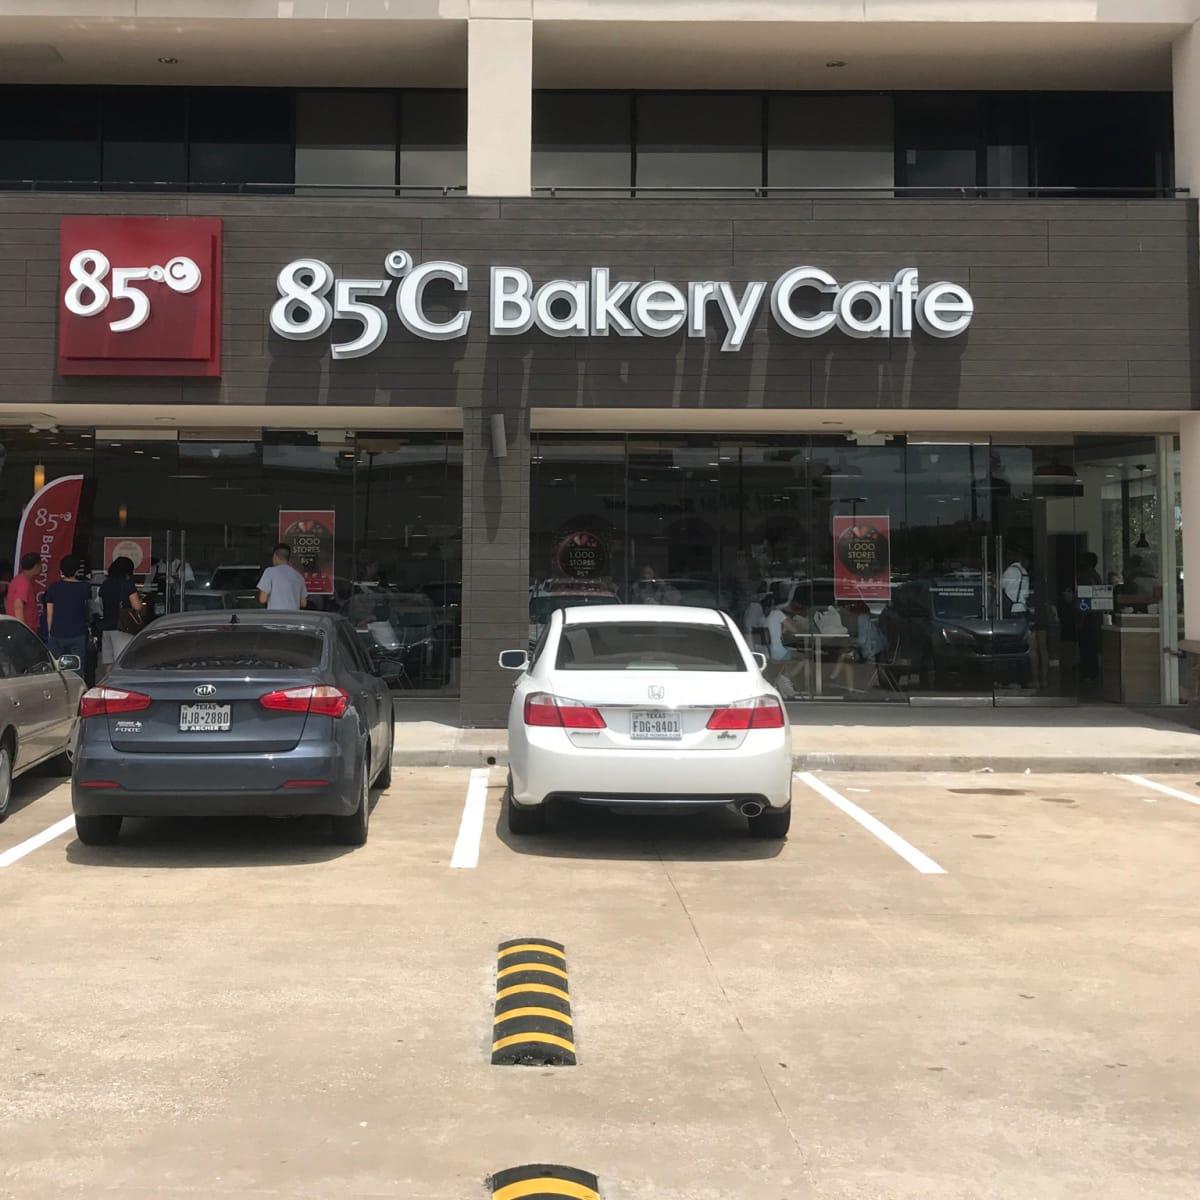 85C Bakery Cafe Houston exterior